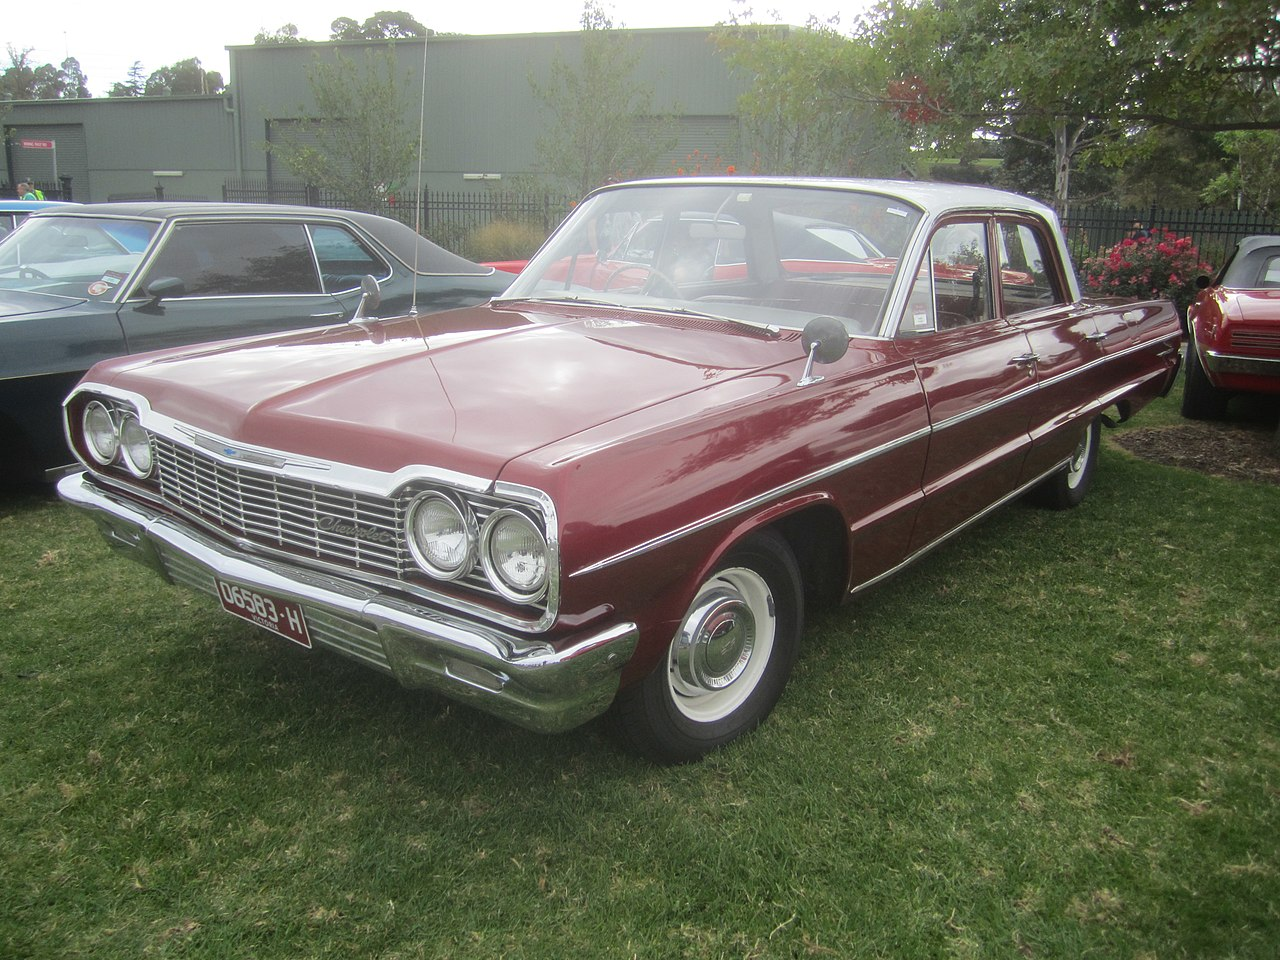 All Chevy chevy bel air 1964 : File:1964 Chevrolet Belair Sedan (2).jpg - Wikimedia Commons